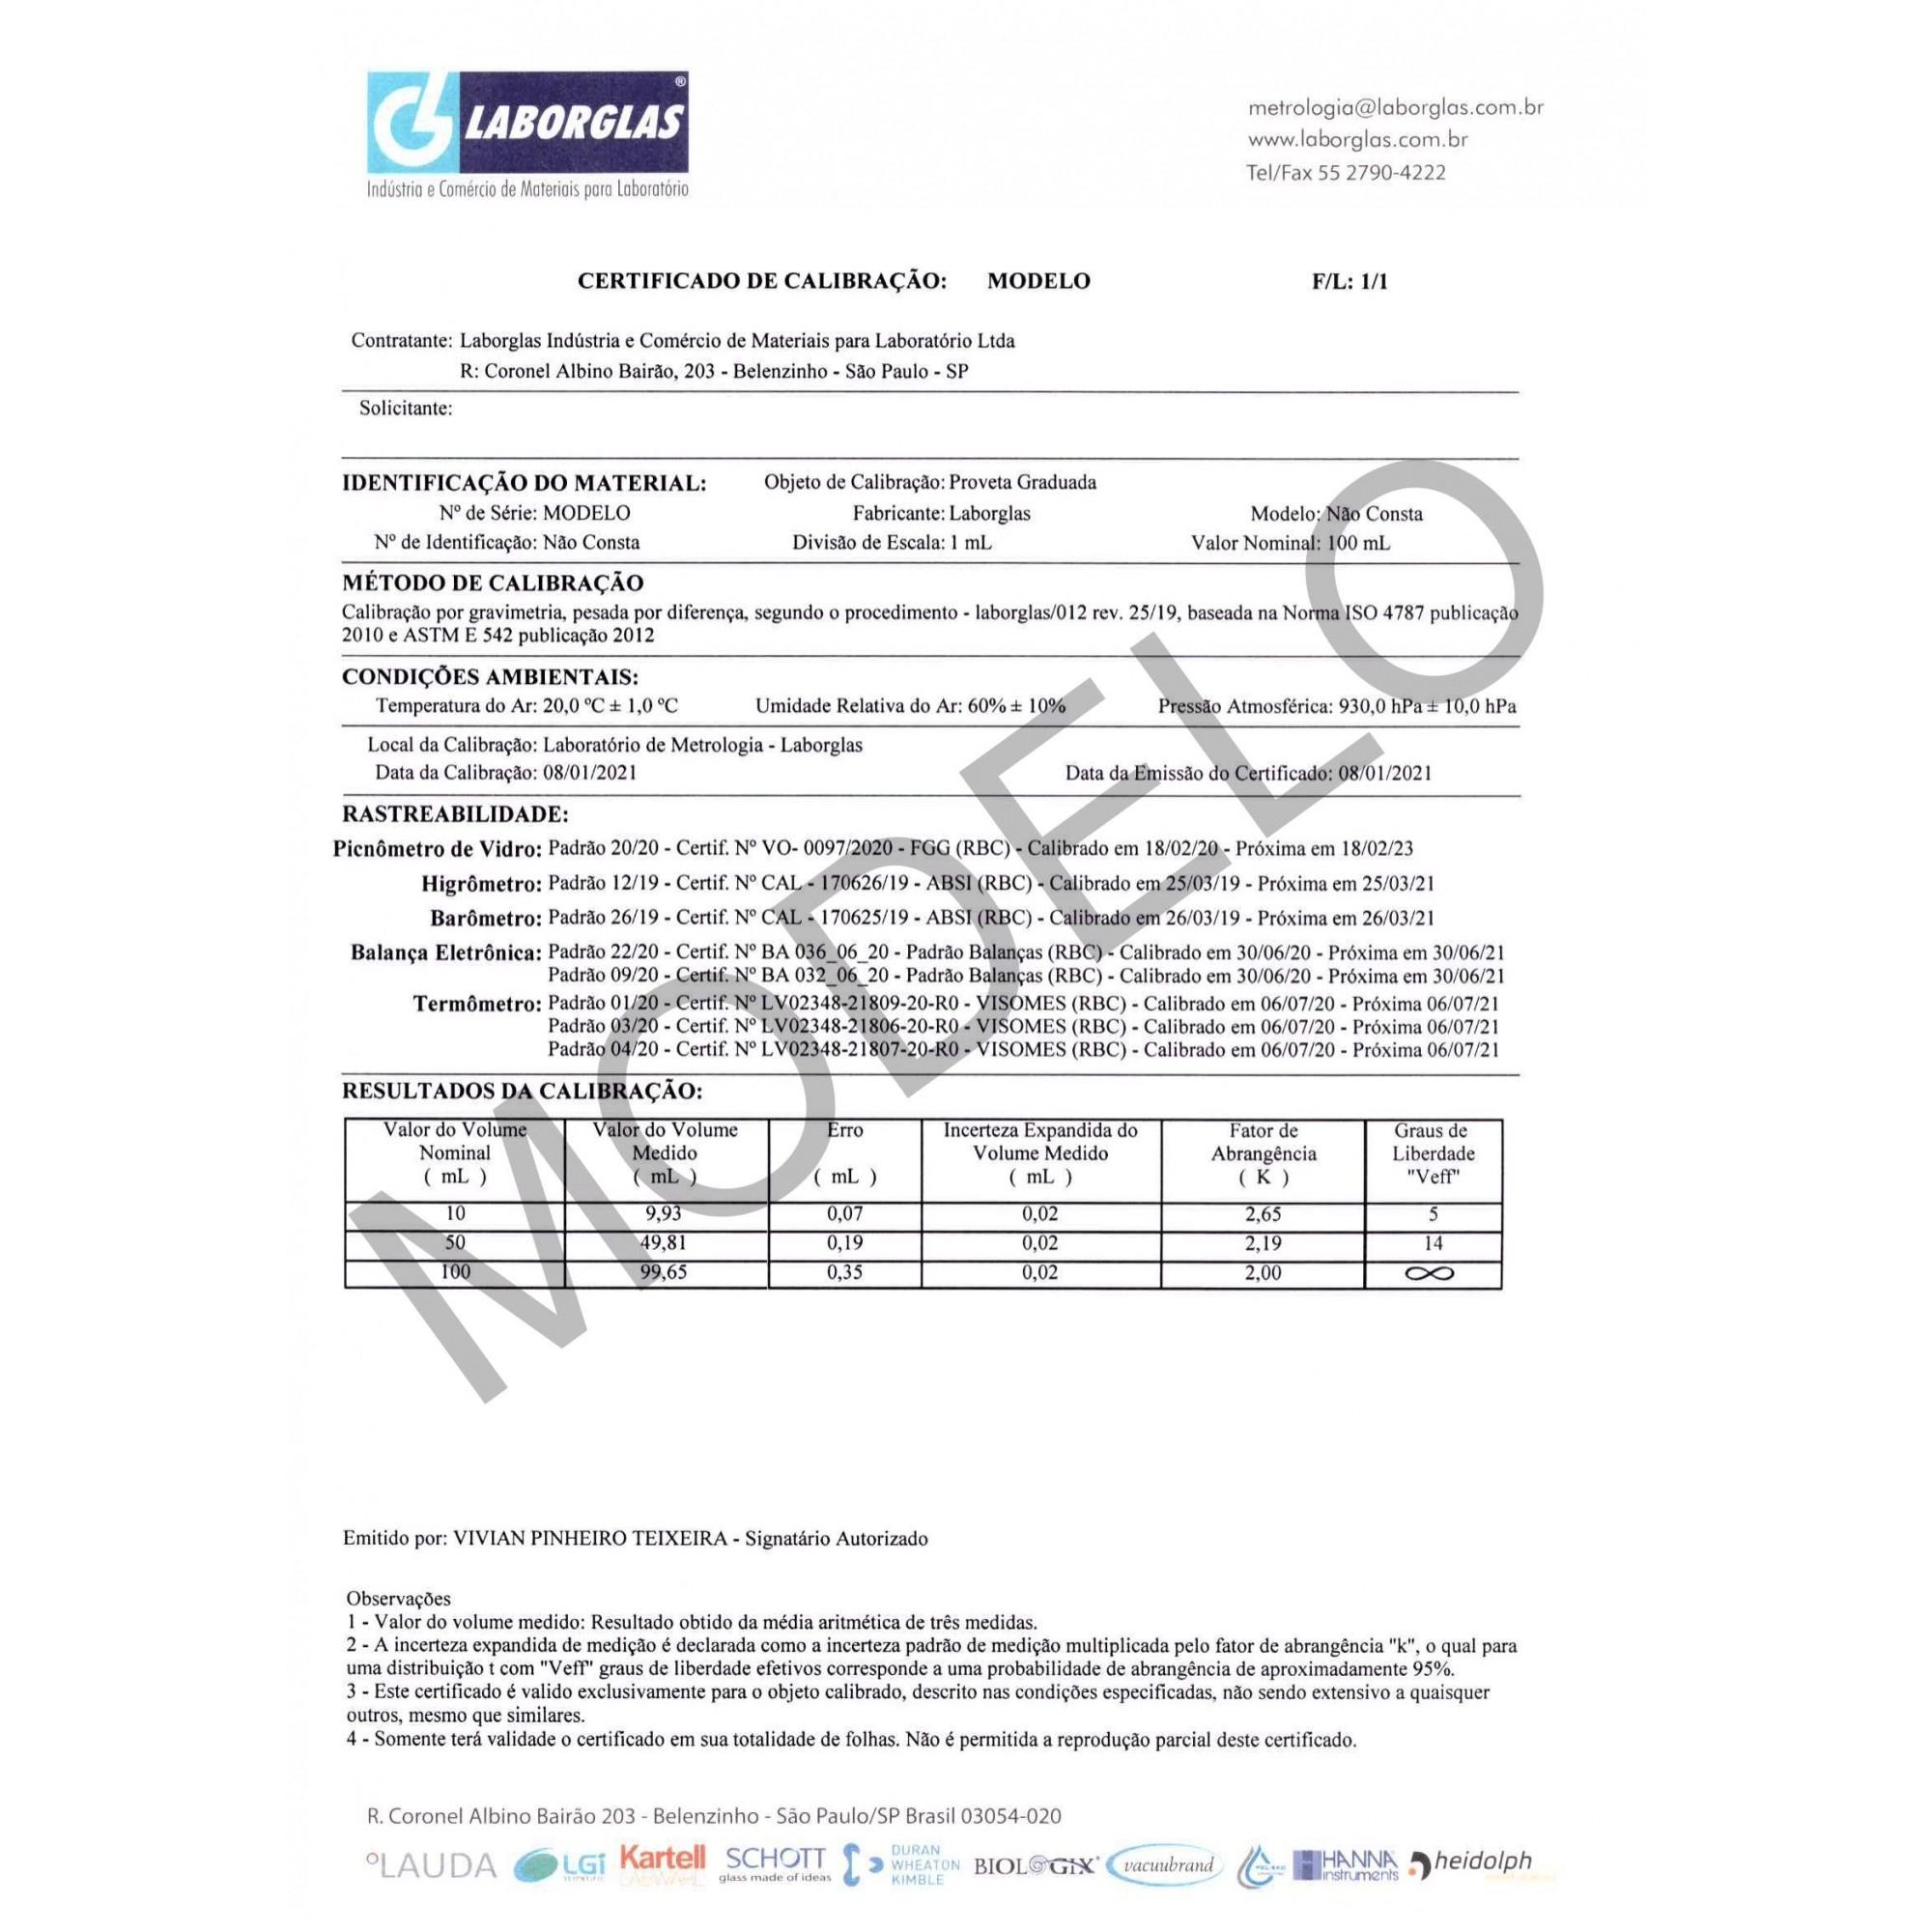 PROVETA GRADUADA BASE HEXAGONAL DE POLIPROPILENO 10 ML CLASSE A CERTIFICADO RASTREÁVEL - Laborglas - Cód. 9138708-C